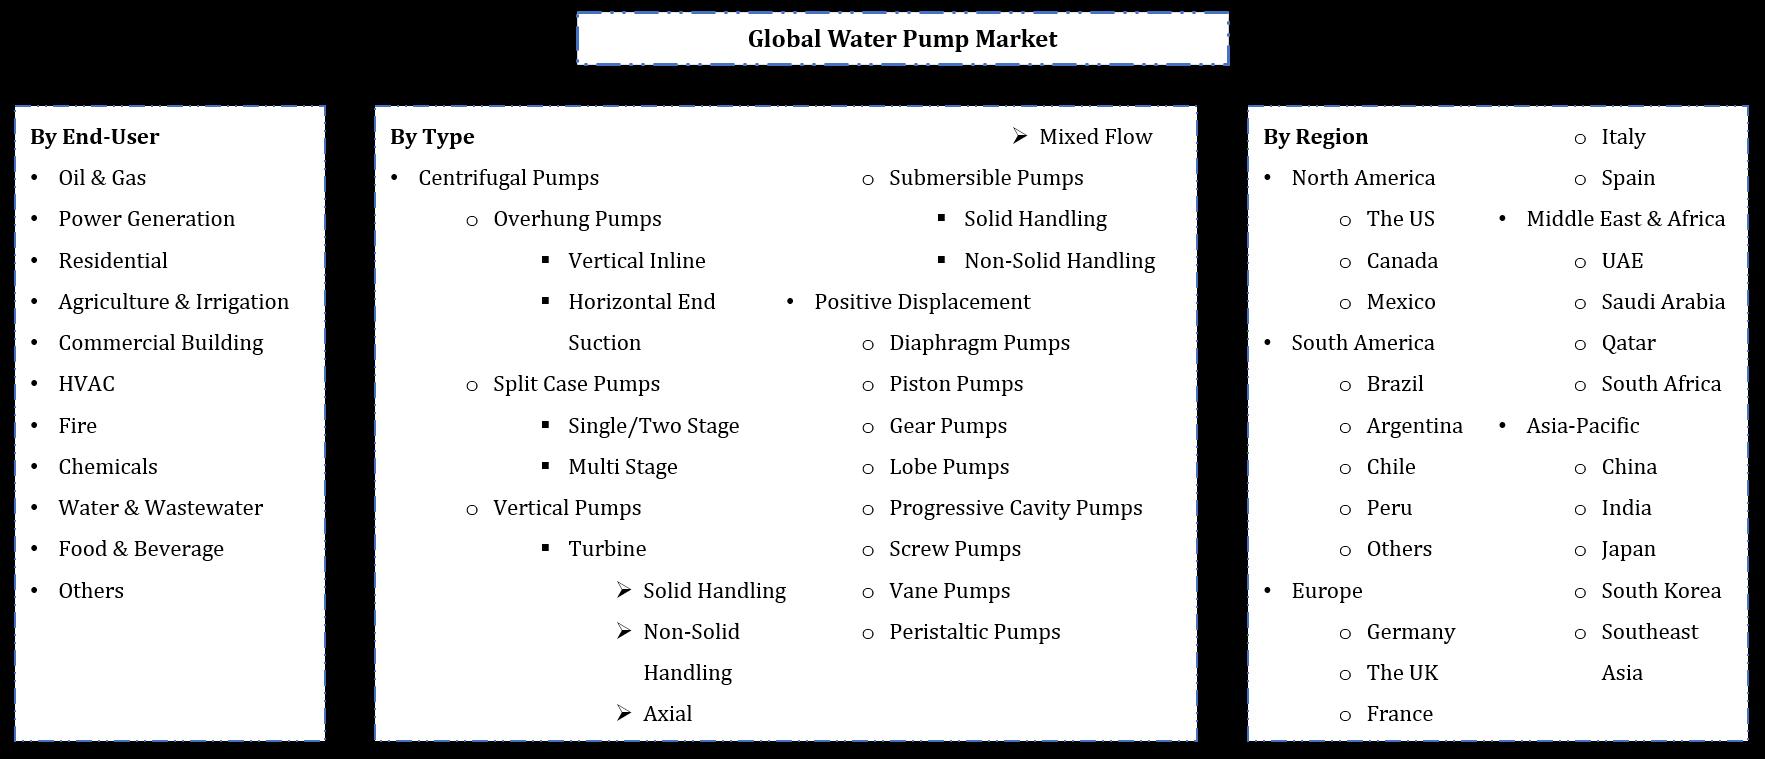 Global Water Pumps Market Segmentation